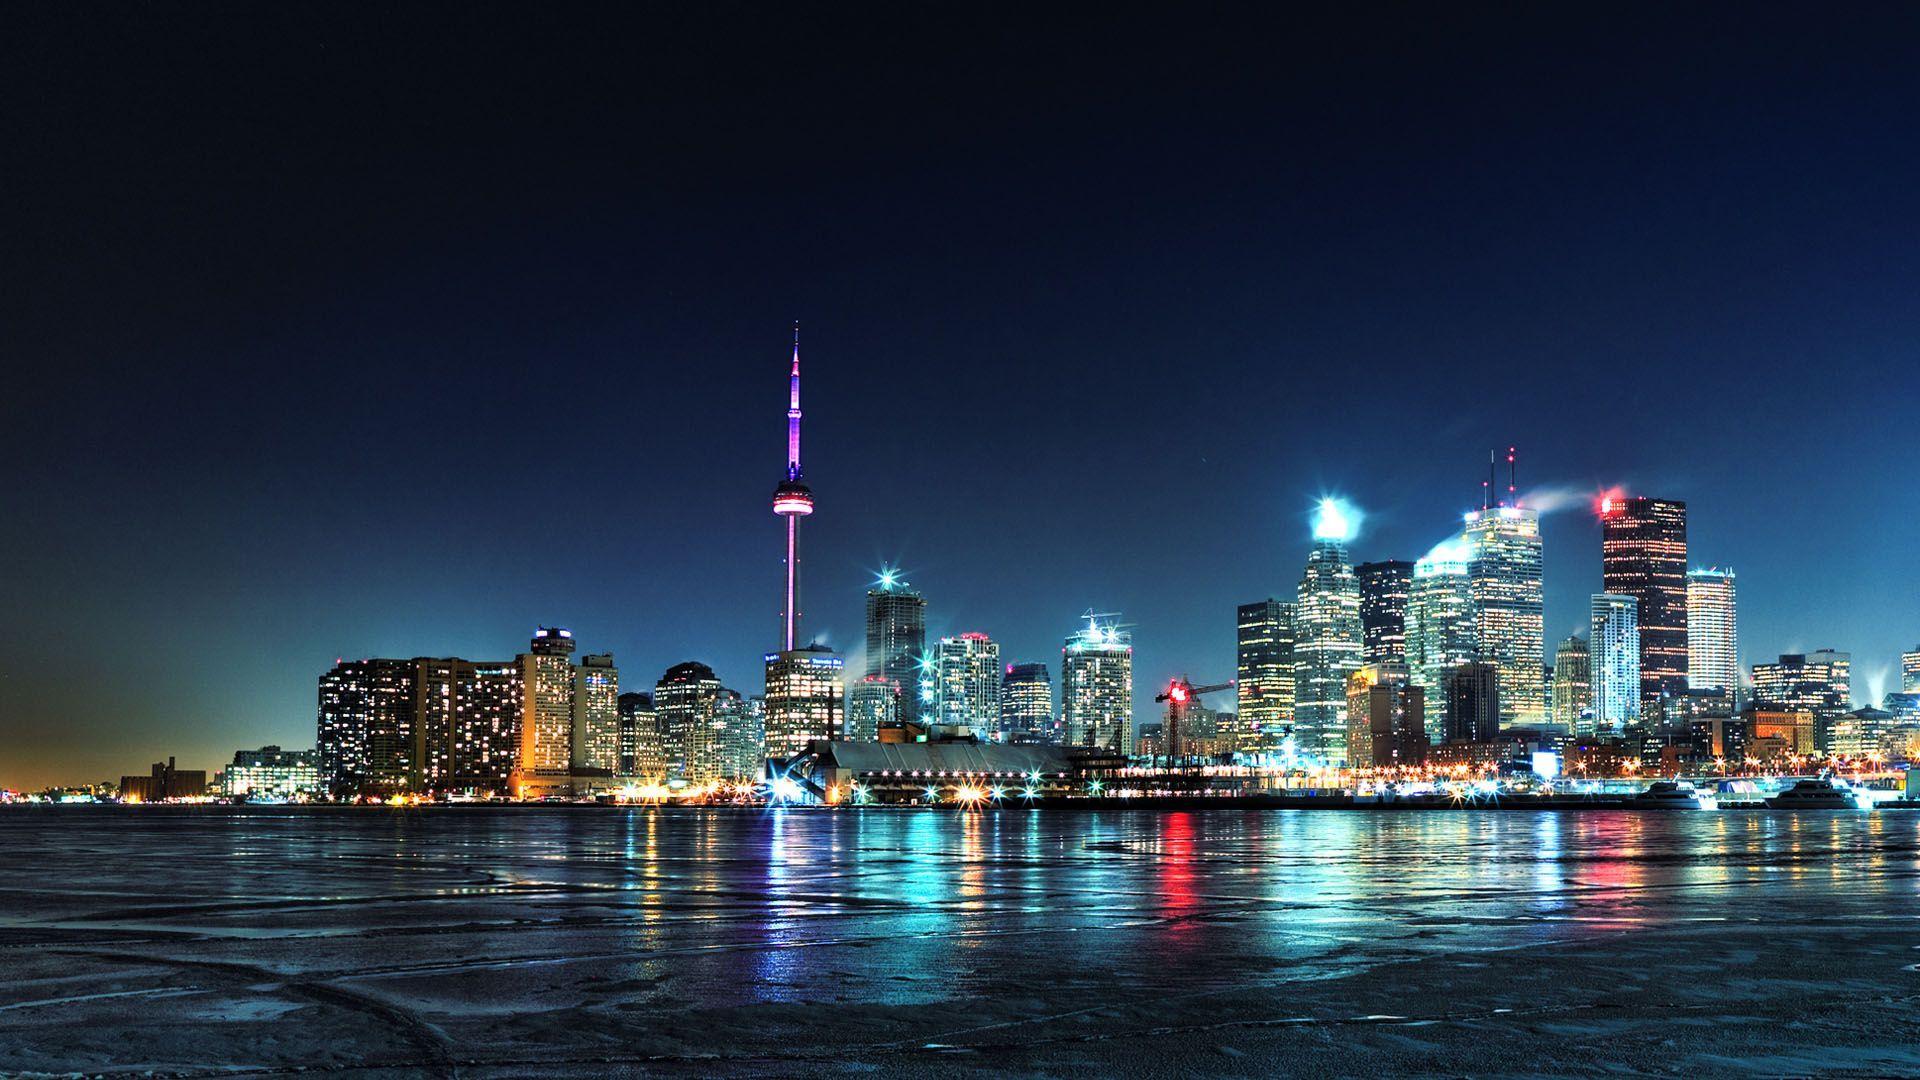 Toronto 1080p wallpaper